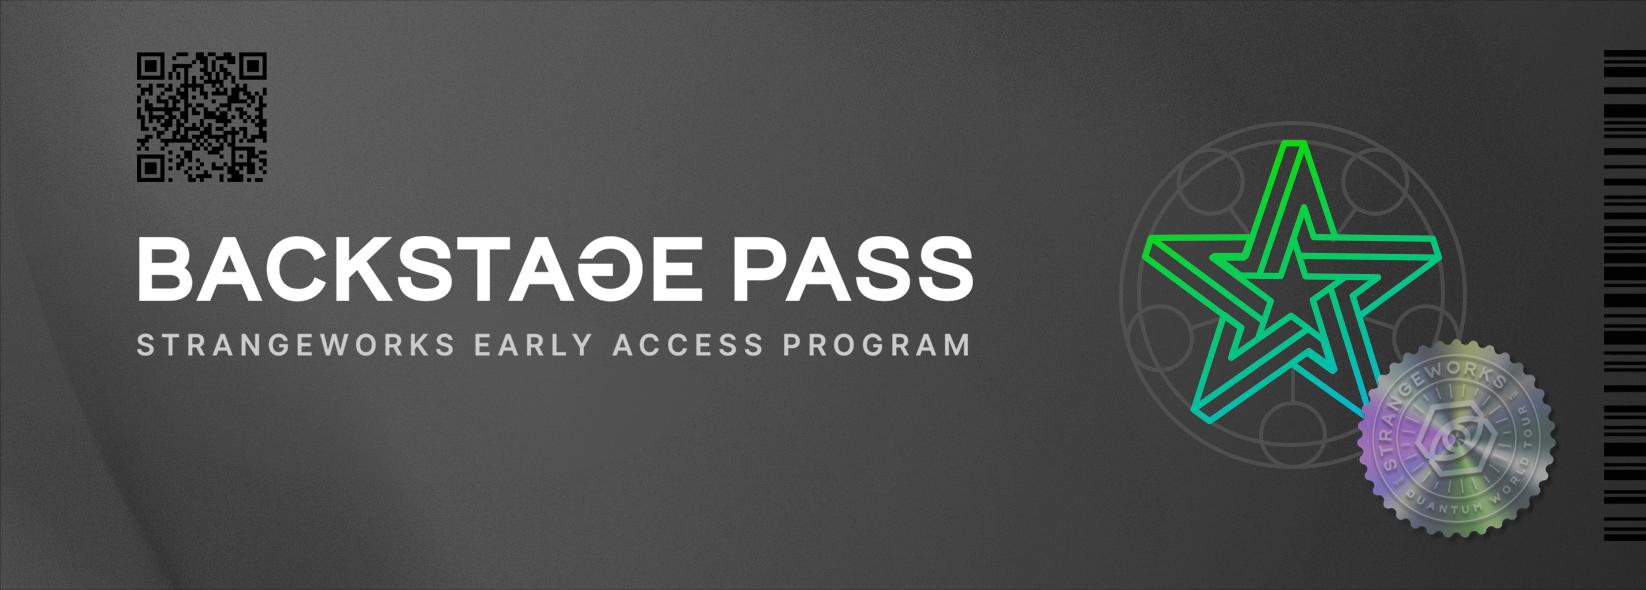 Strangeworks Backstage Pass Program